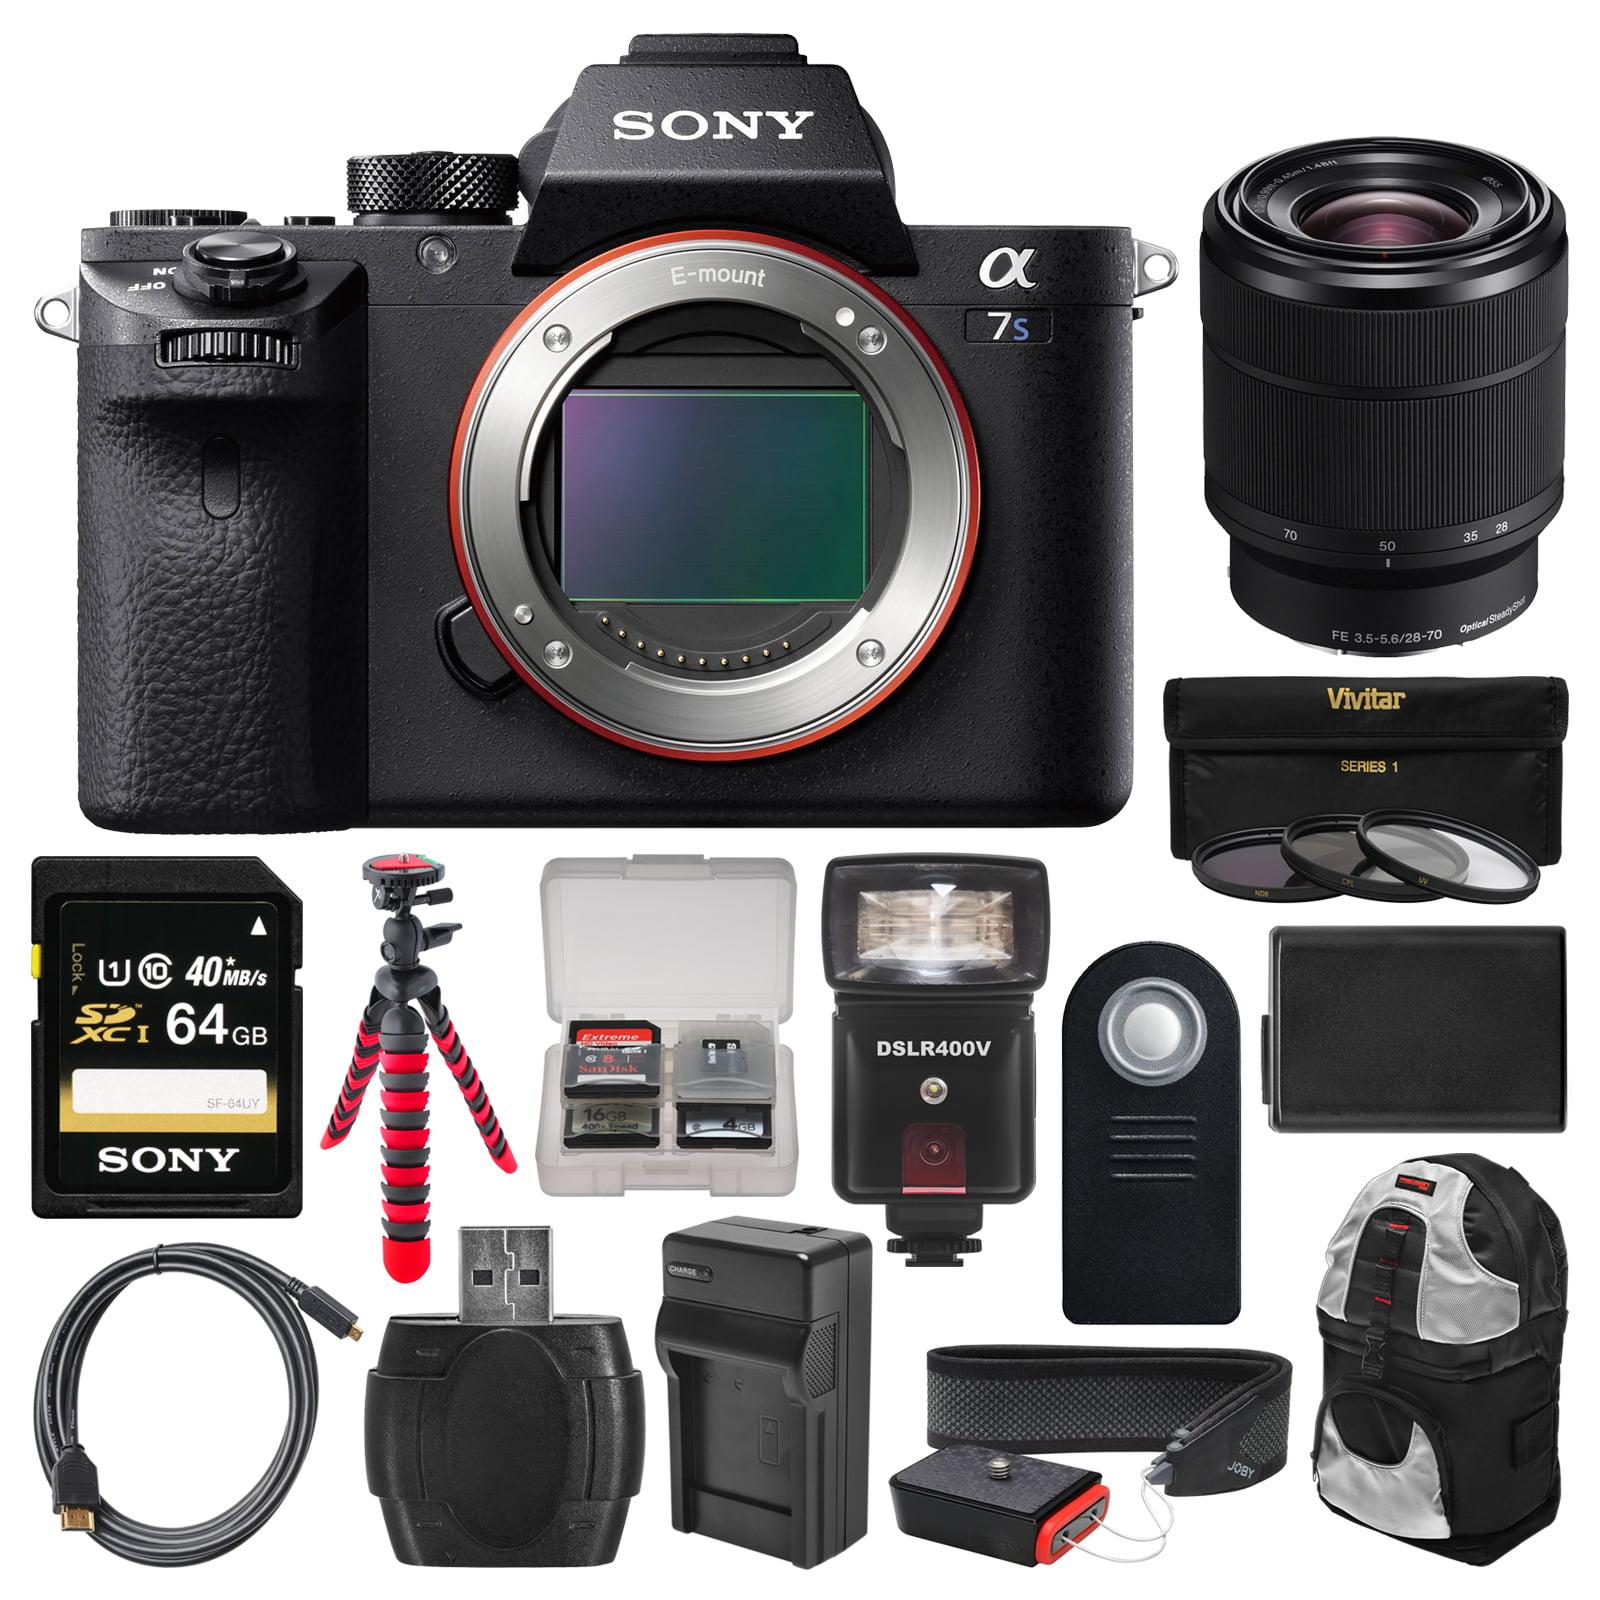 Sony Alpha A7S II 4K Wi-Fi Digital Camera Body with FE 28-70mm Lens + 64GB Card + Backpack + Flash + Battery &... by Sony